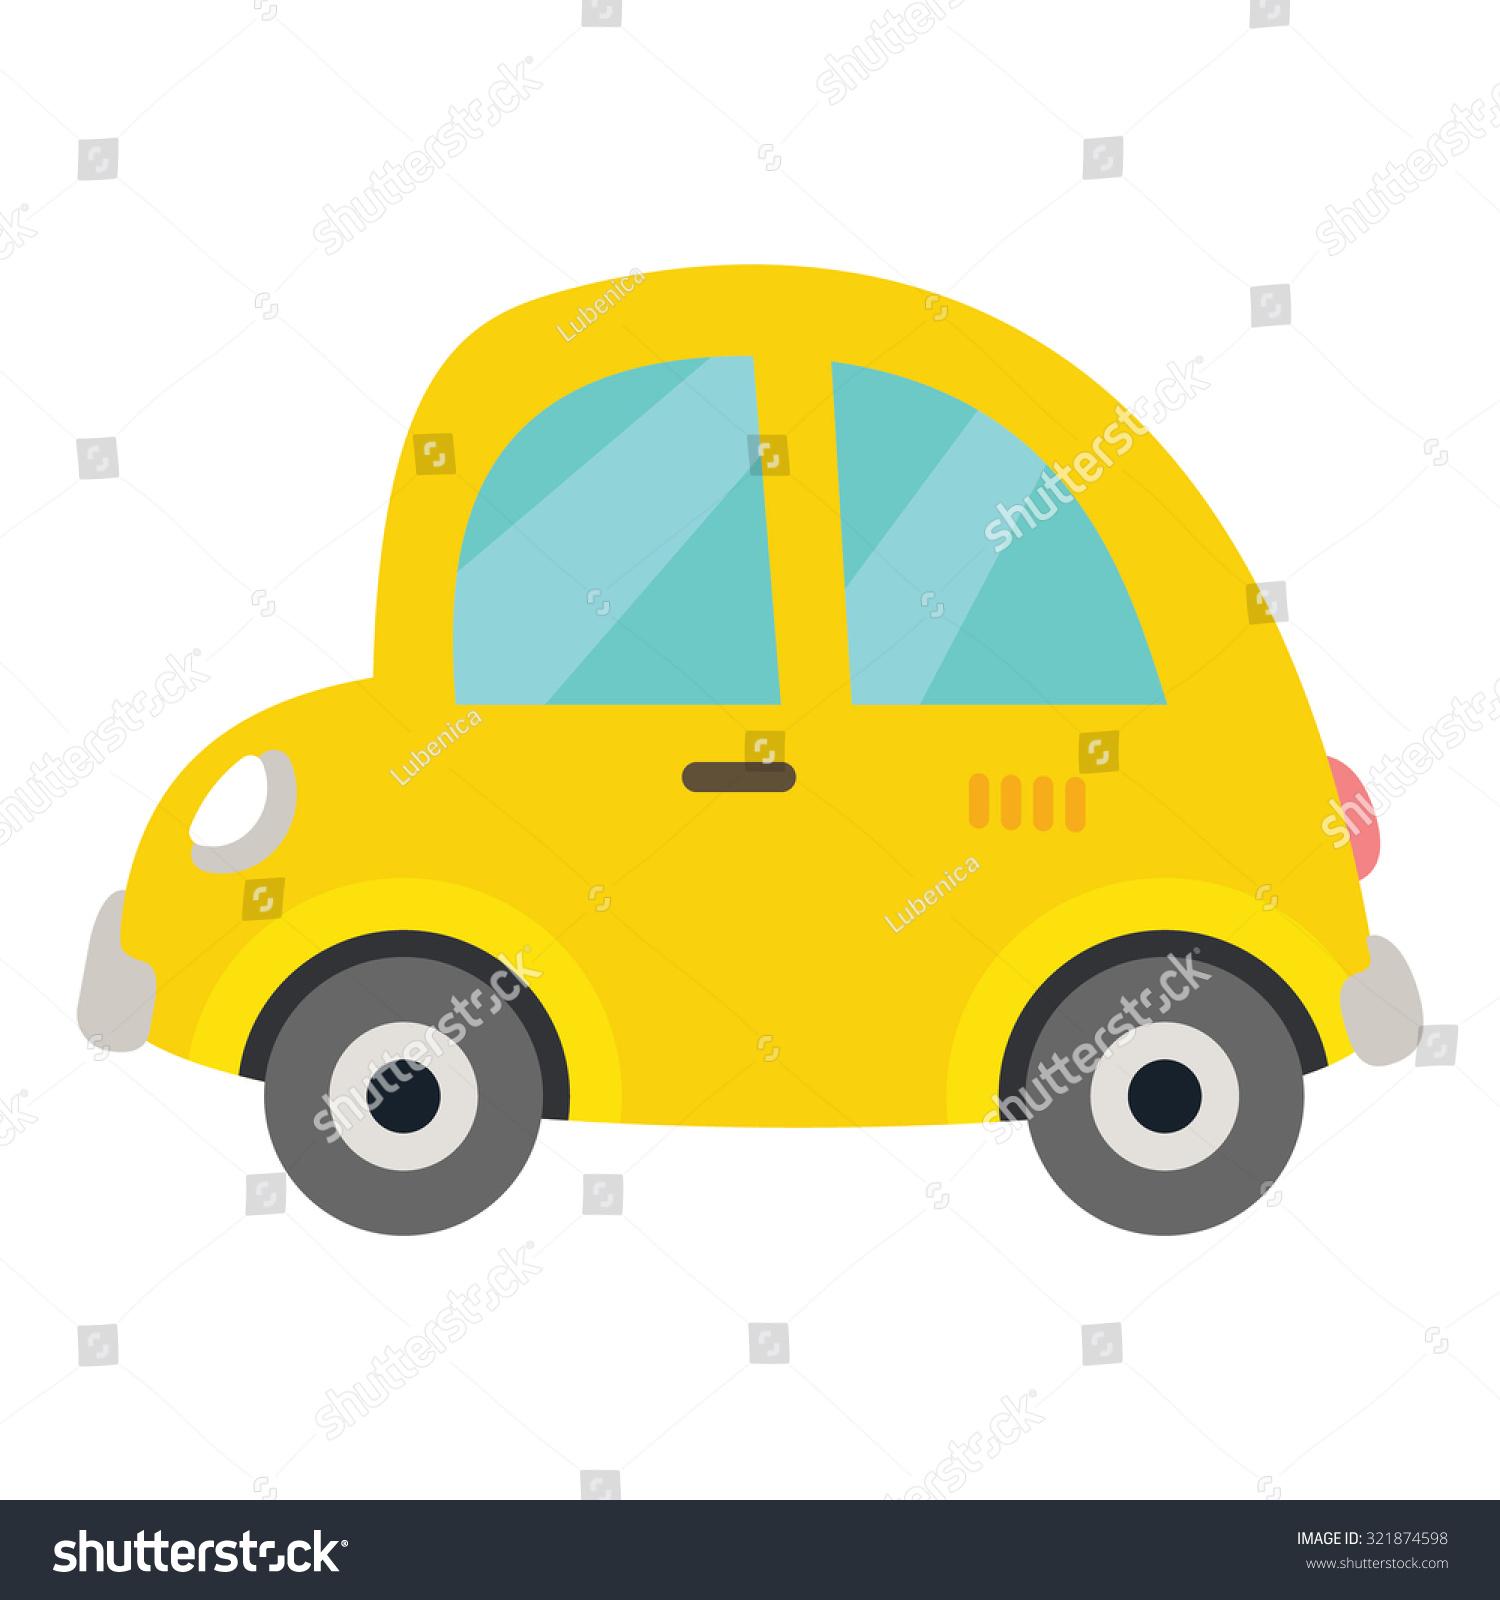 Pics Photos Yellow Background Children Sweetheart Cartoon Cars Templates Psd